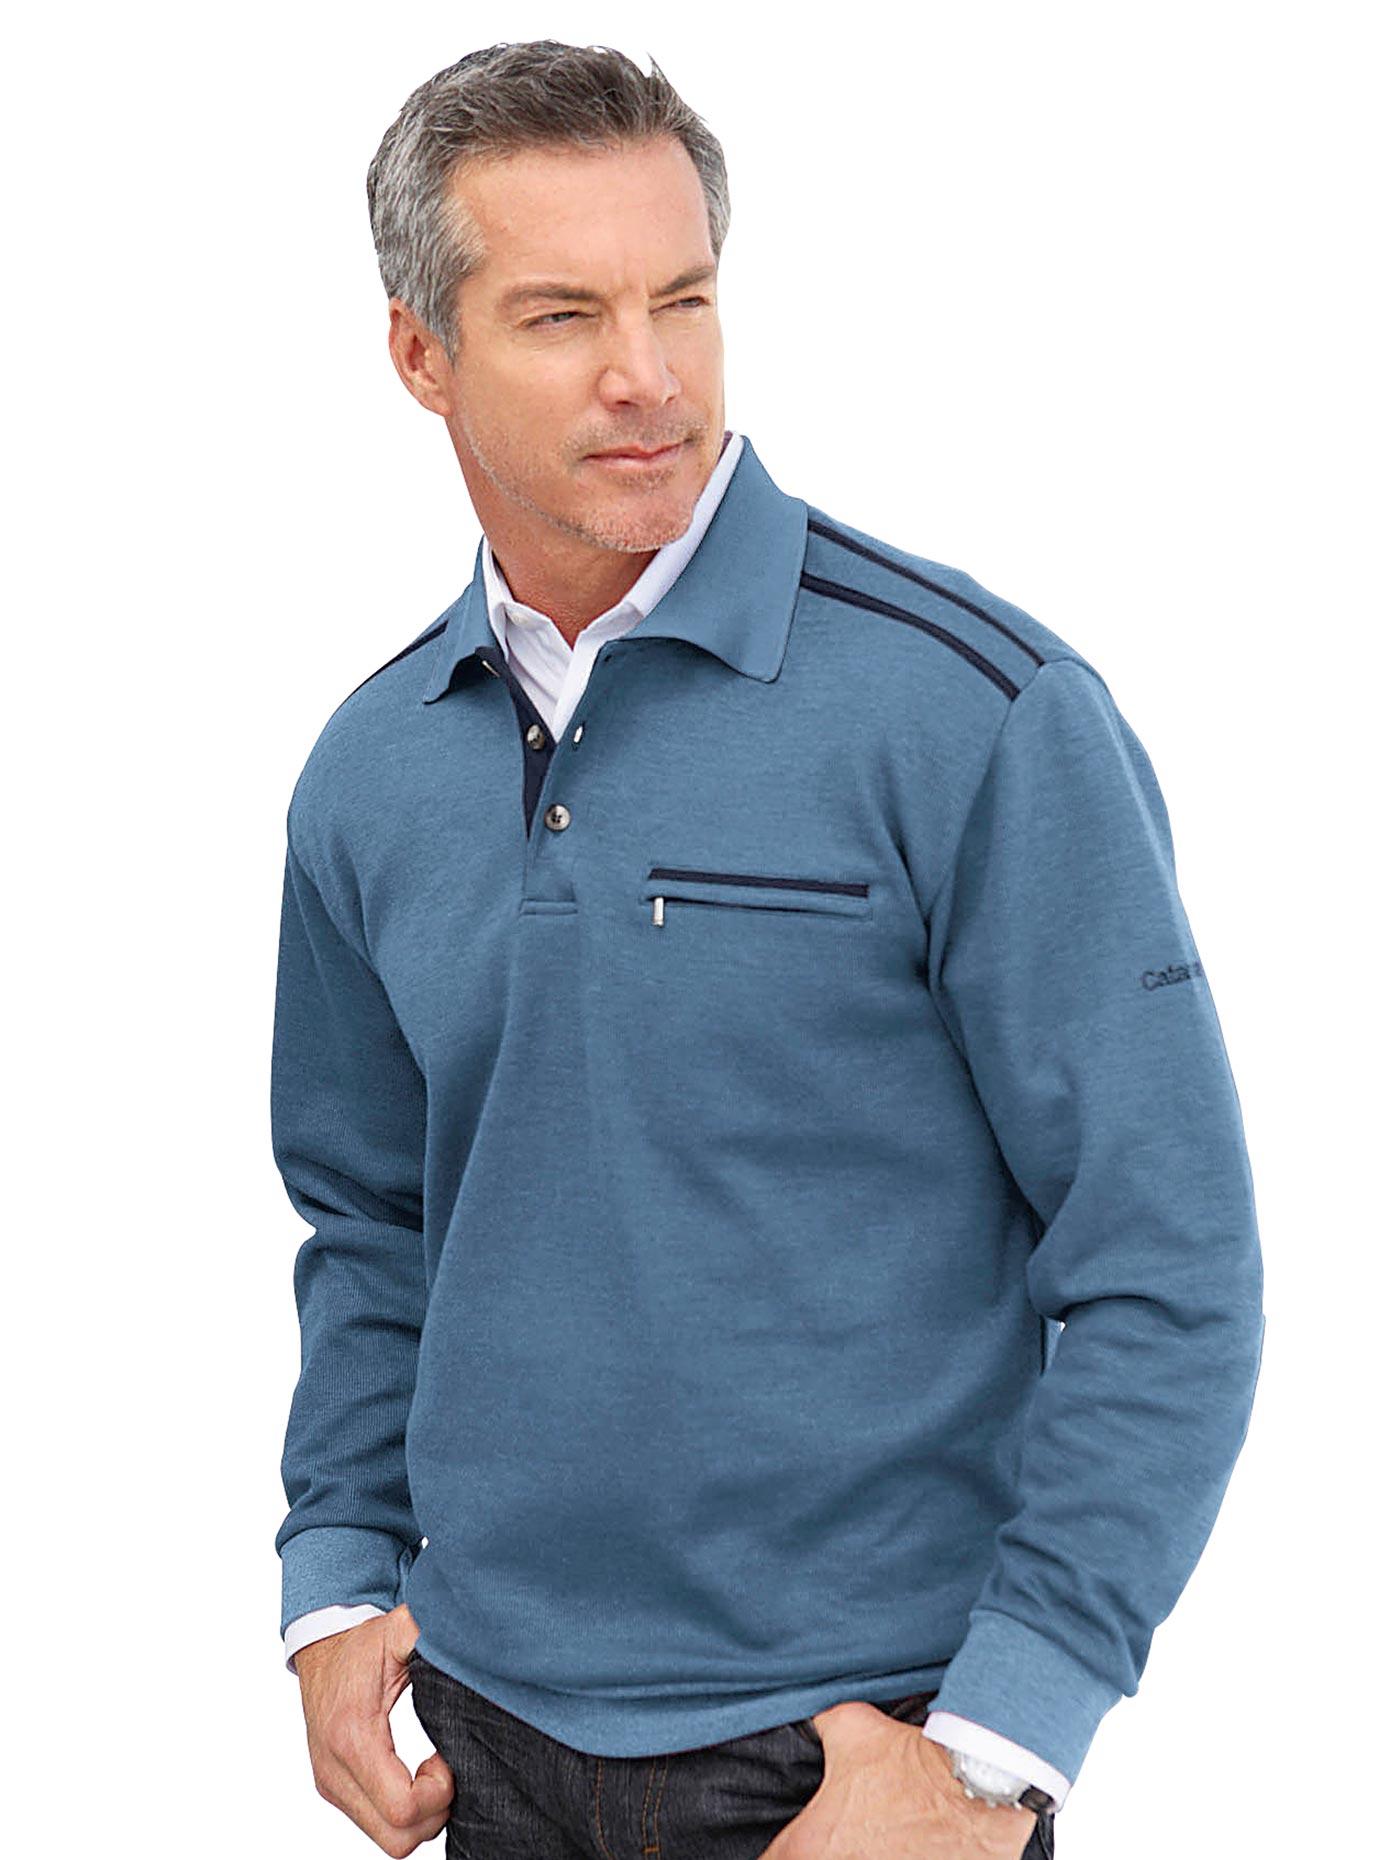 Catamaran Sweatshirt mit Knopfleiste | Bekleidung > Sweatshirts & -jacken > Sweatshirts | Blau | Baumwolle | CATAMARAN